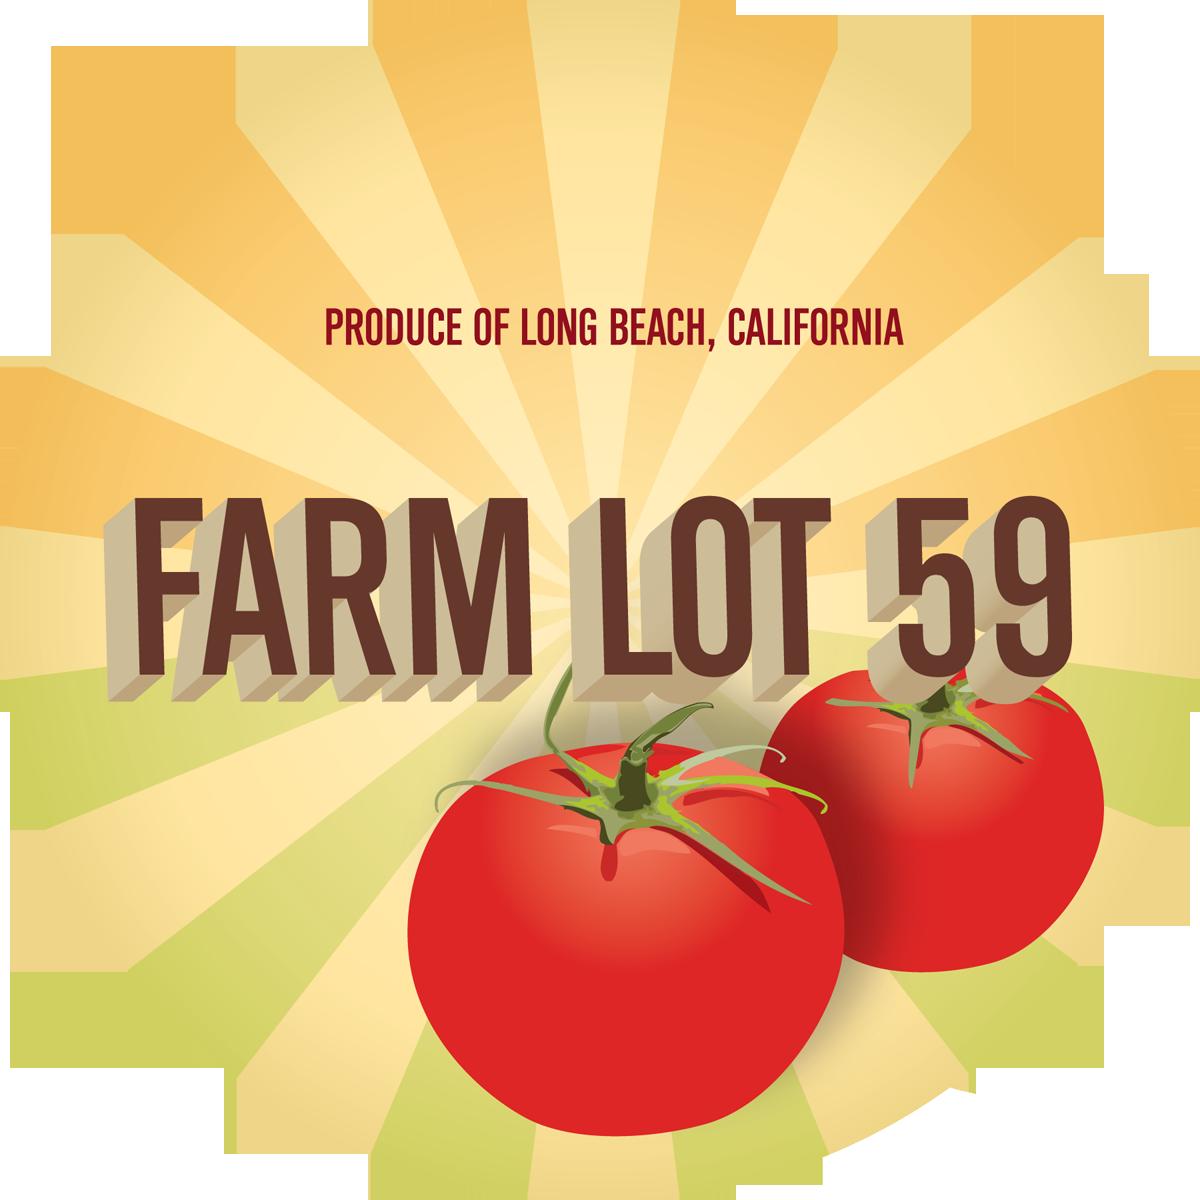 Farmlot59 tomatologo circle